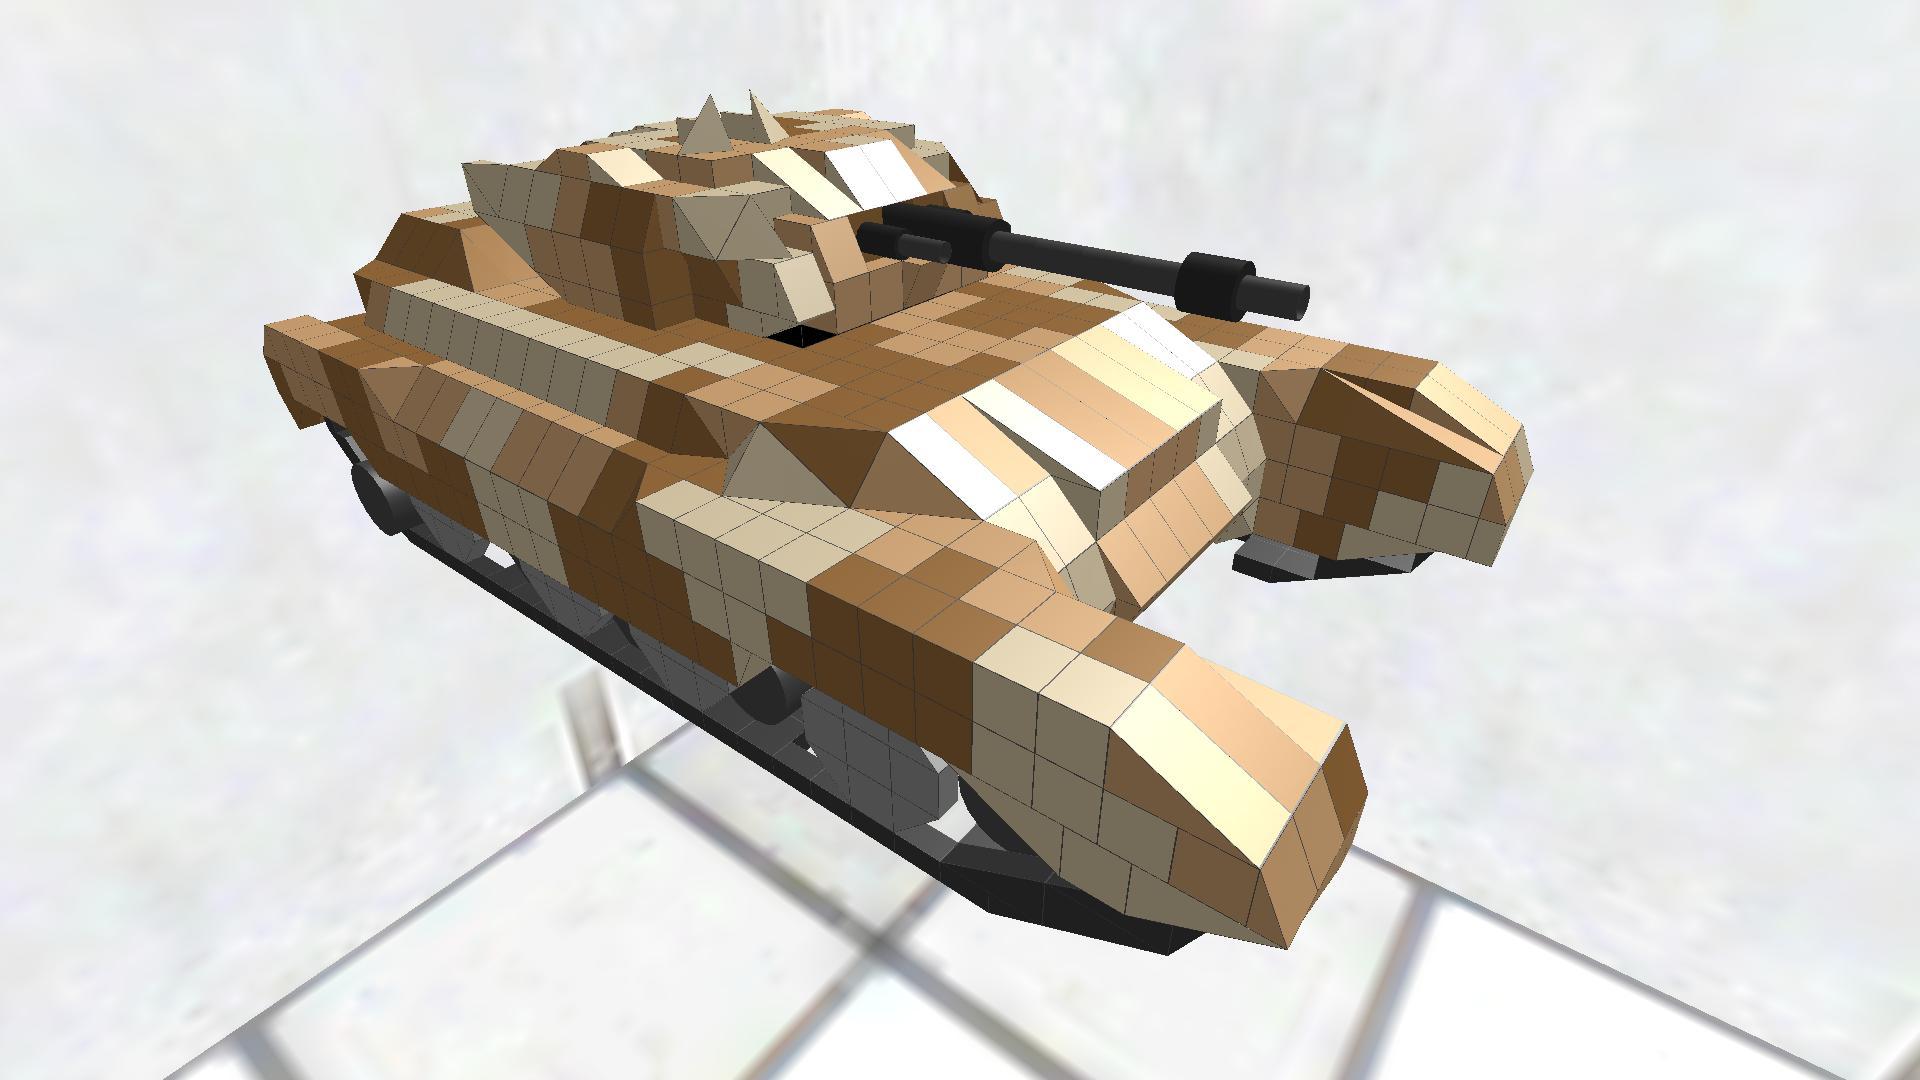 Imperial Guard MK-5 Desert